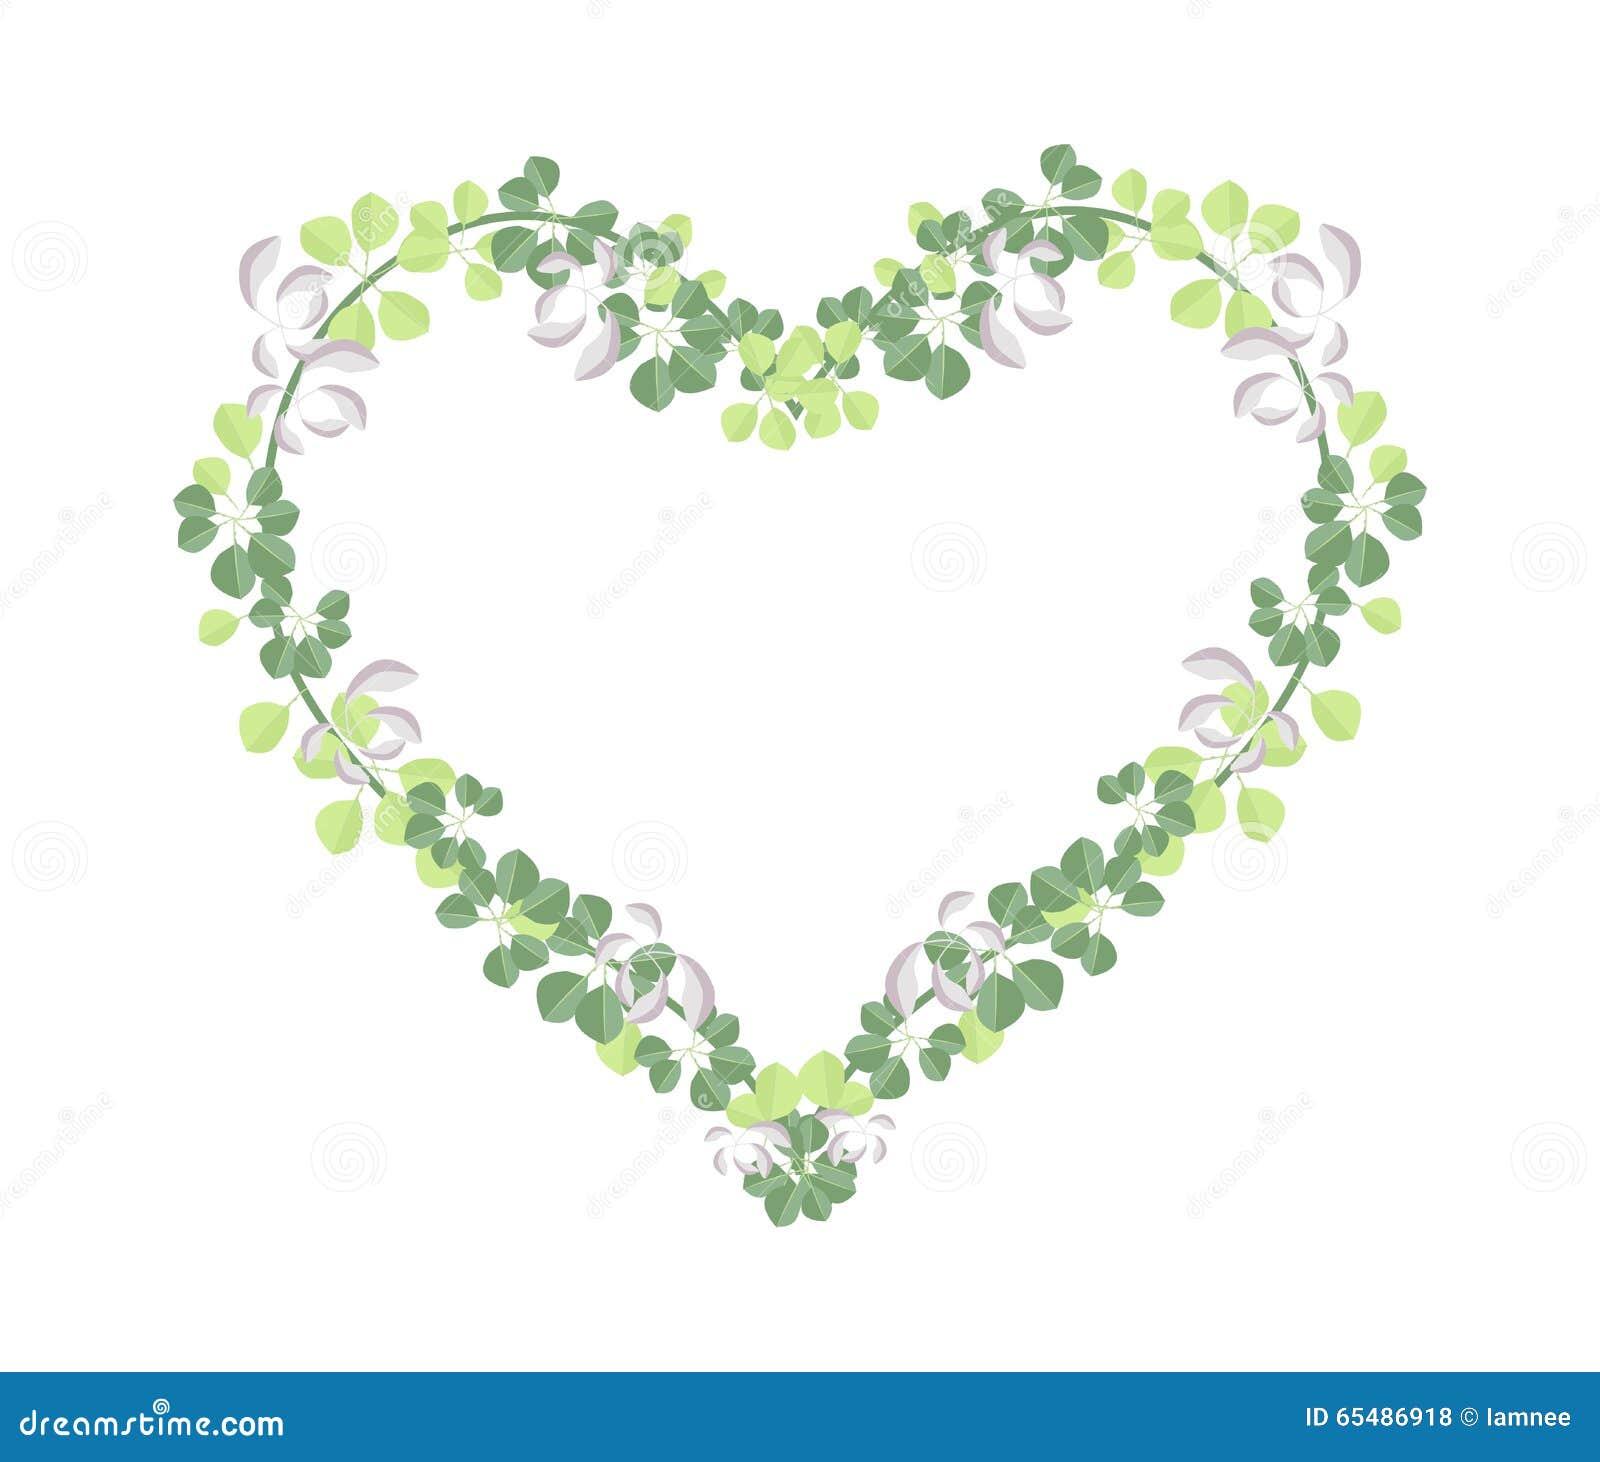 Fresh Vine Leaves In Beautiful Heart Shape Stock Vector ...